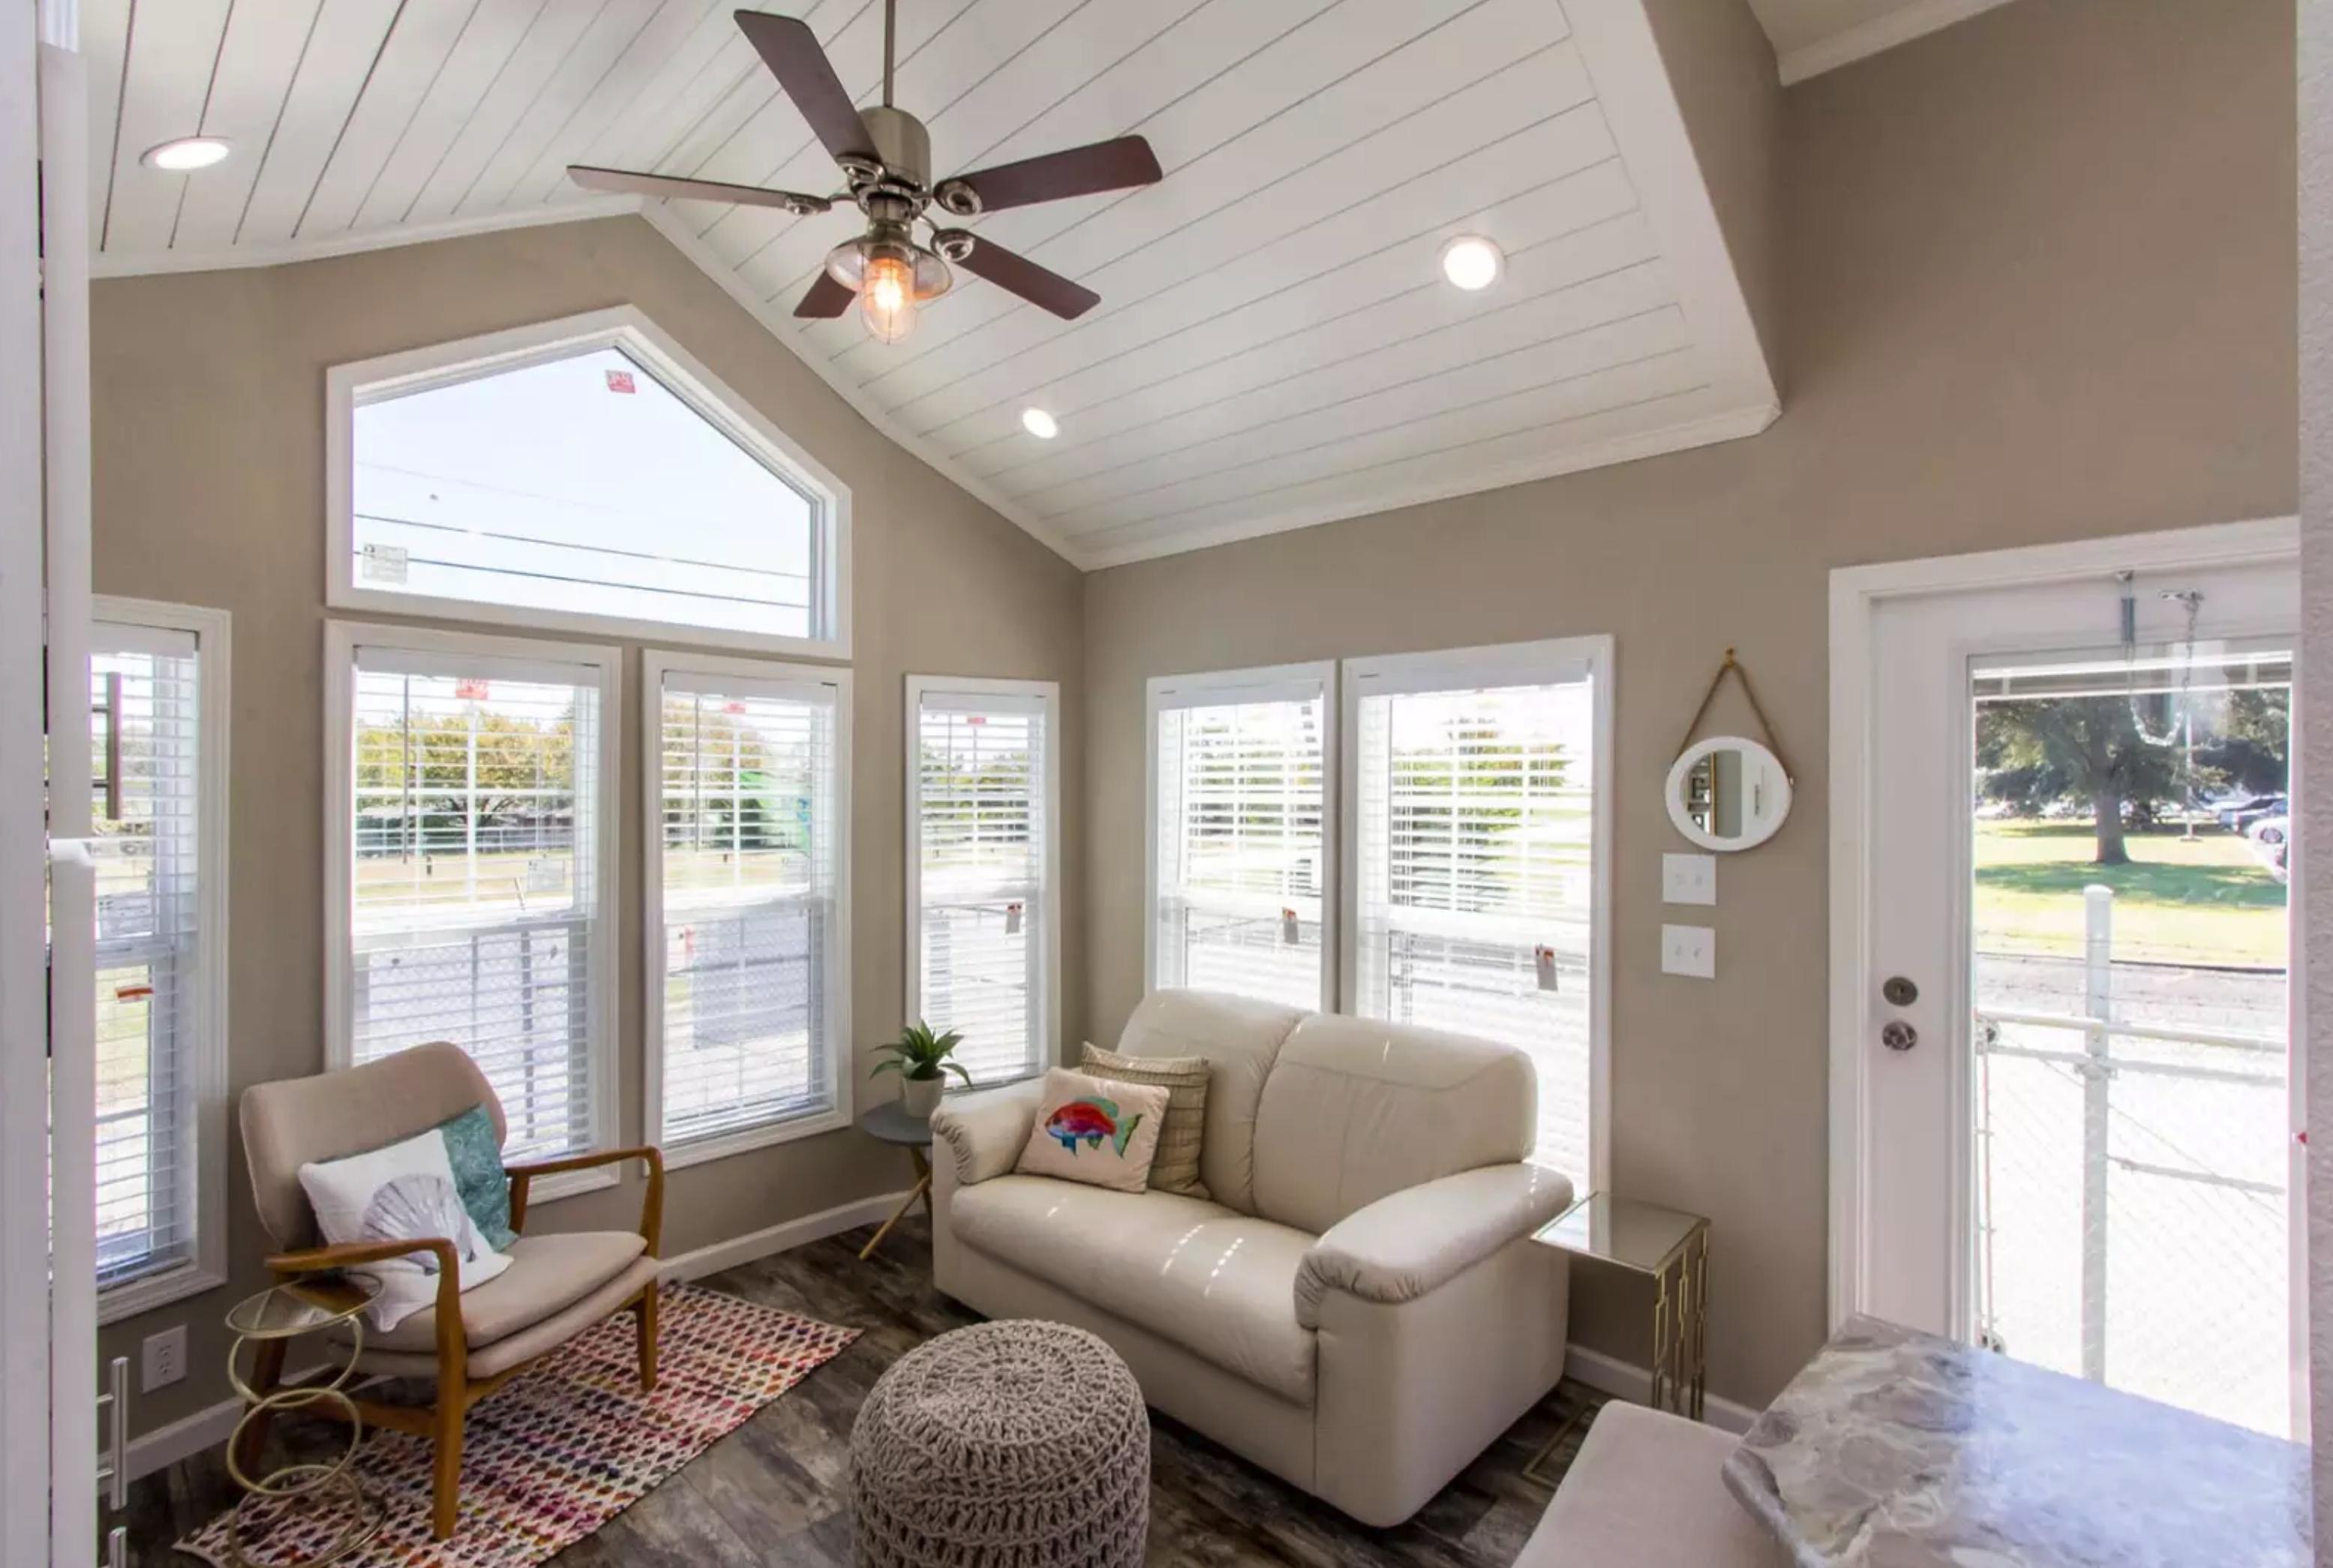 The Laguna APH-527 living room